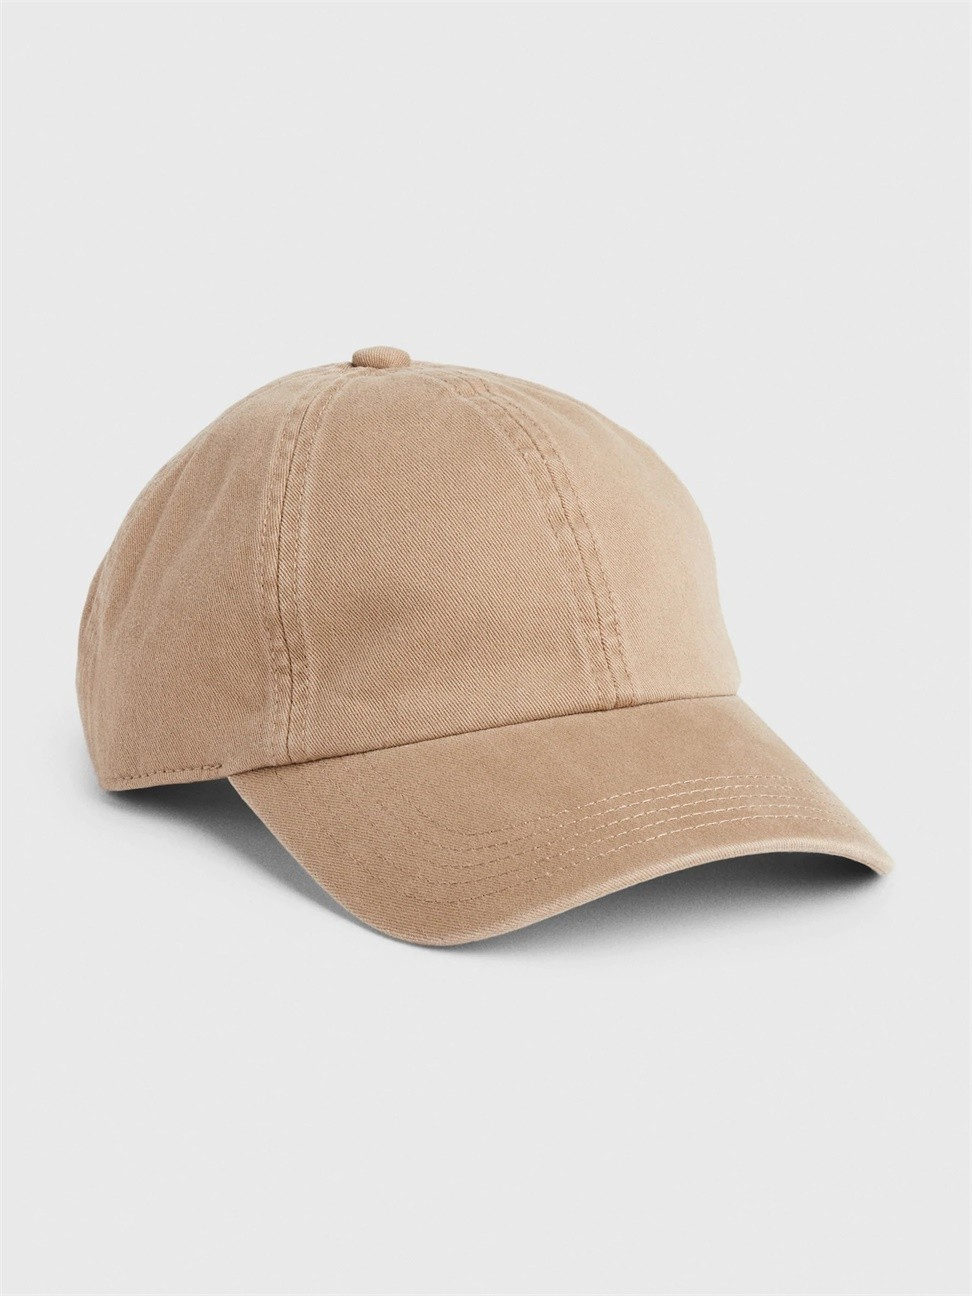 Gap 盖璞 542524 棉质舒适纯色鸭舌帽